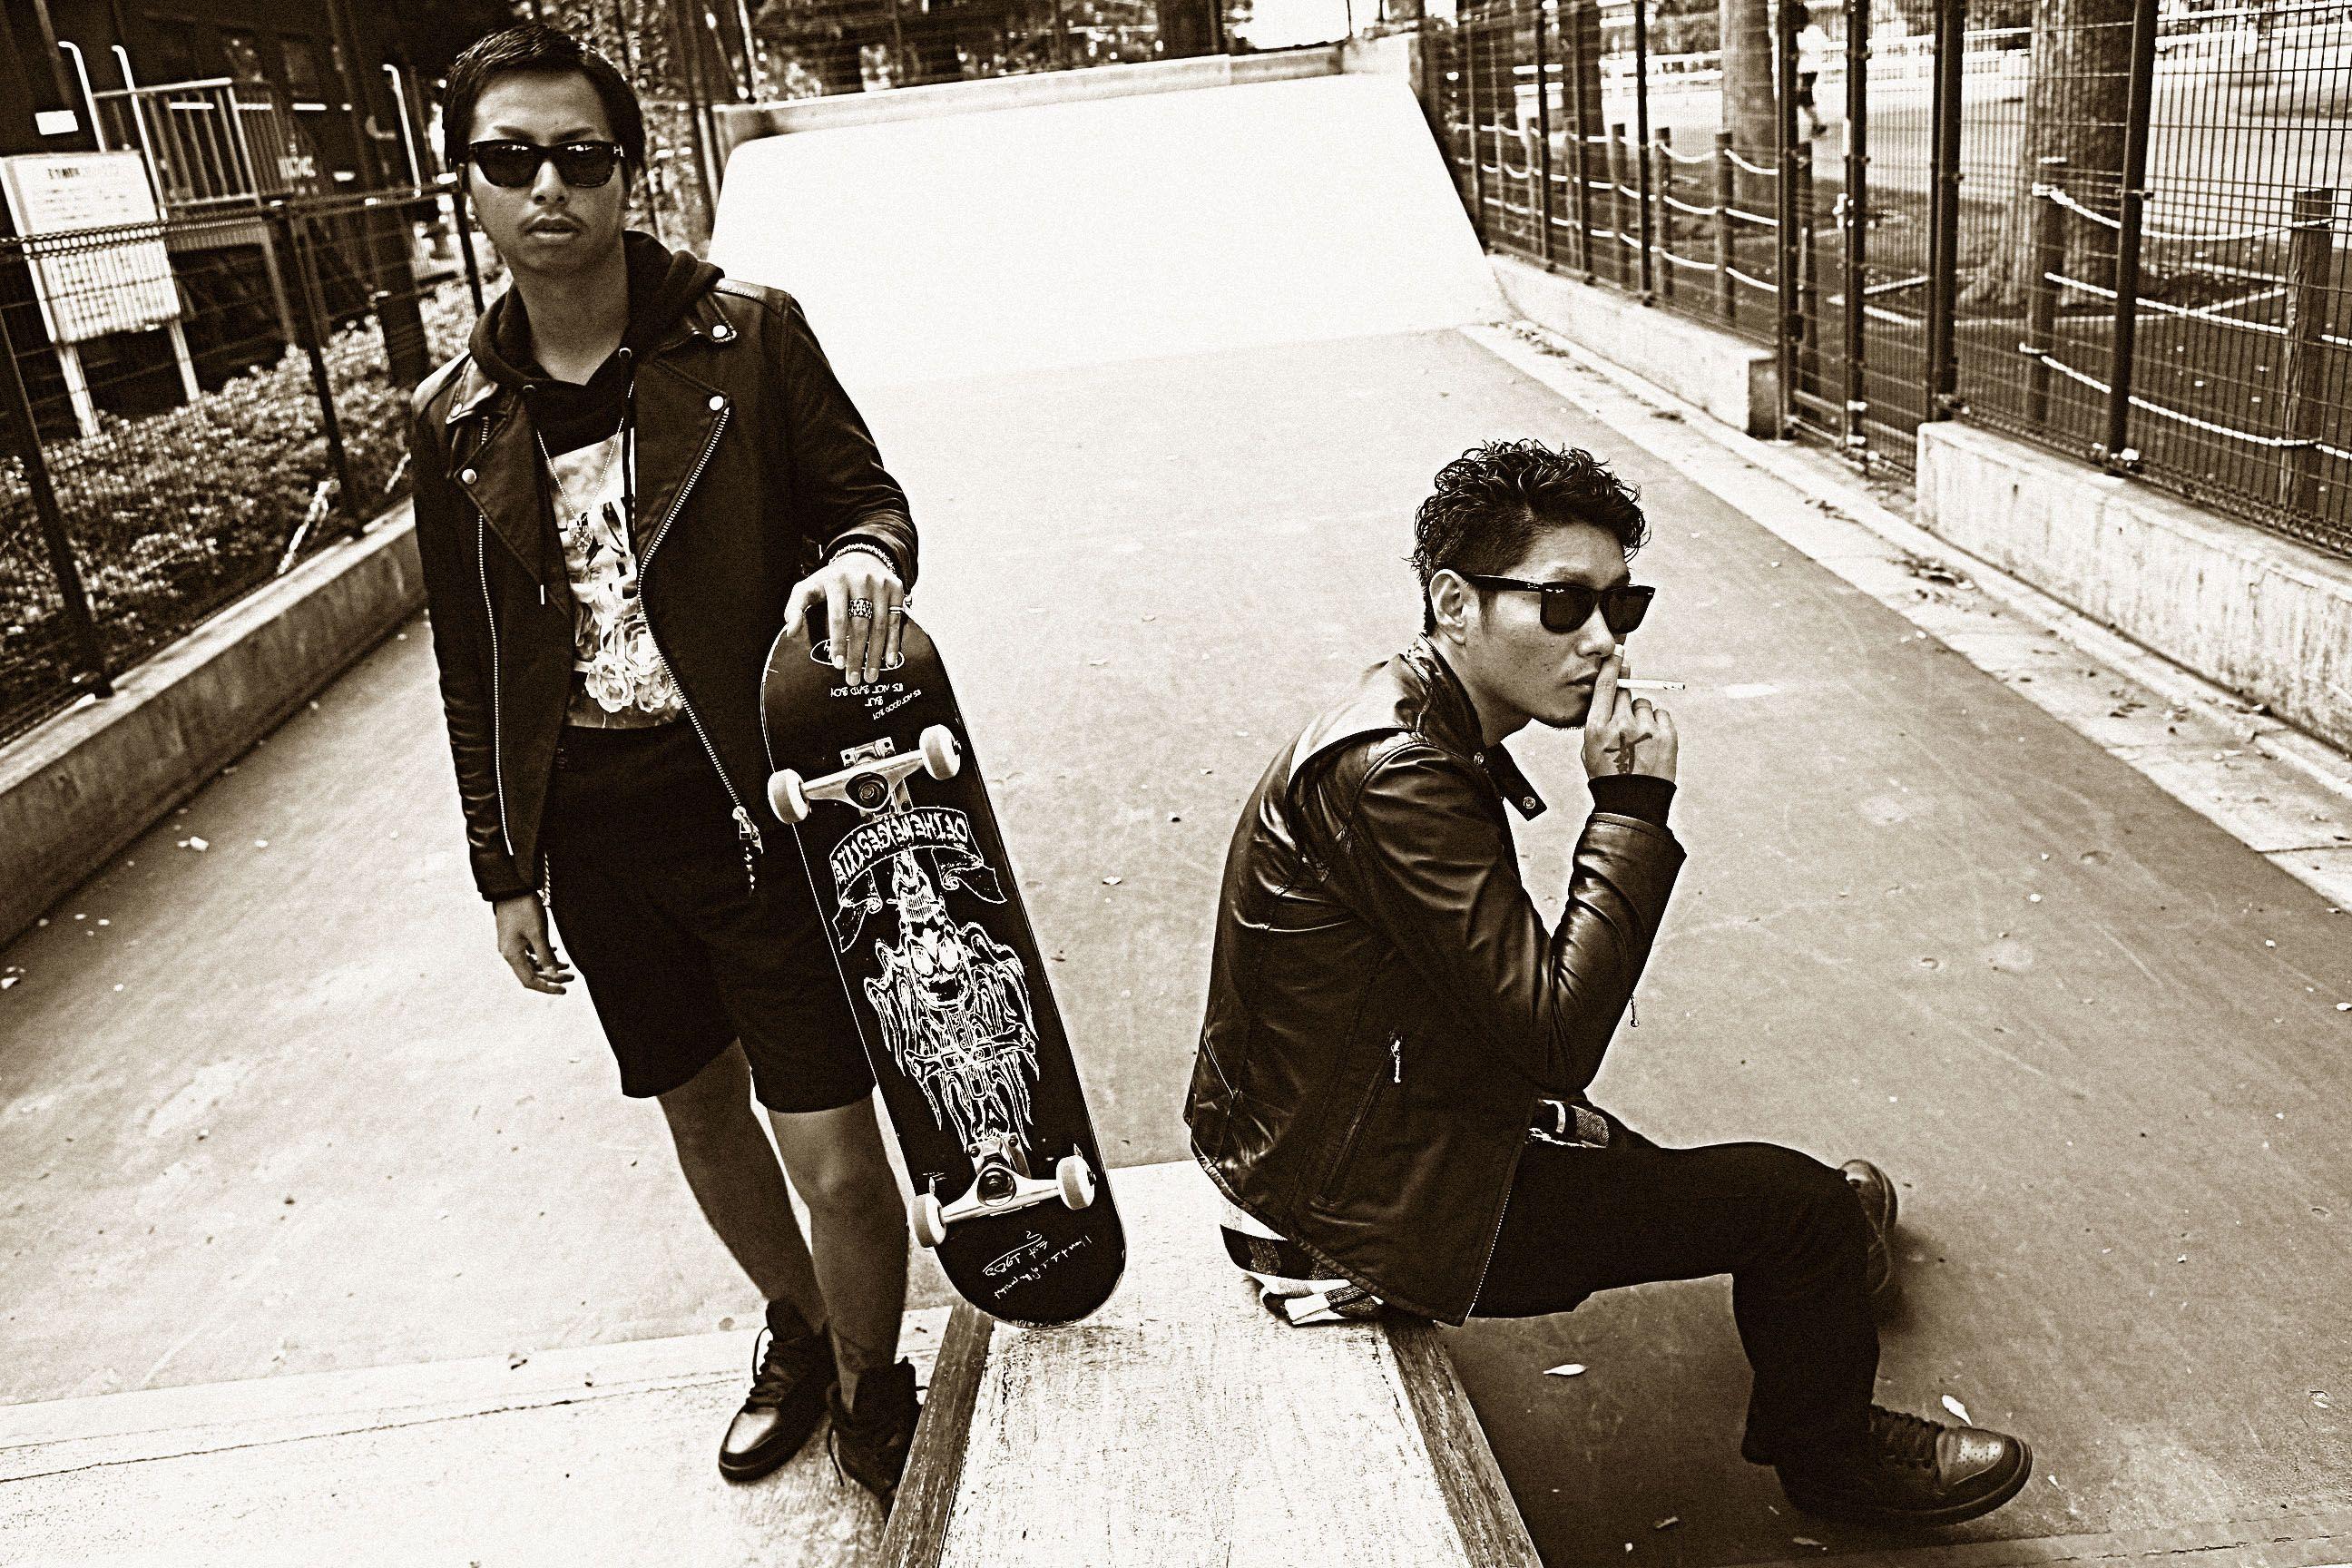 "TOKYO STREET THUG LIFE ""FUCK"" #ofthenigestyle #tokyo #street #thug #life #fuck #look #swag #gang #black #style #skateboard"